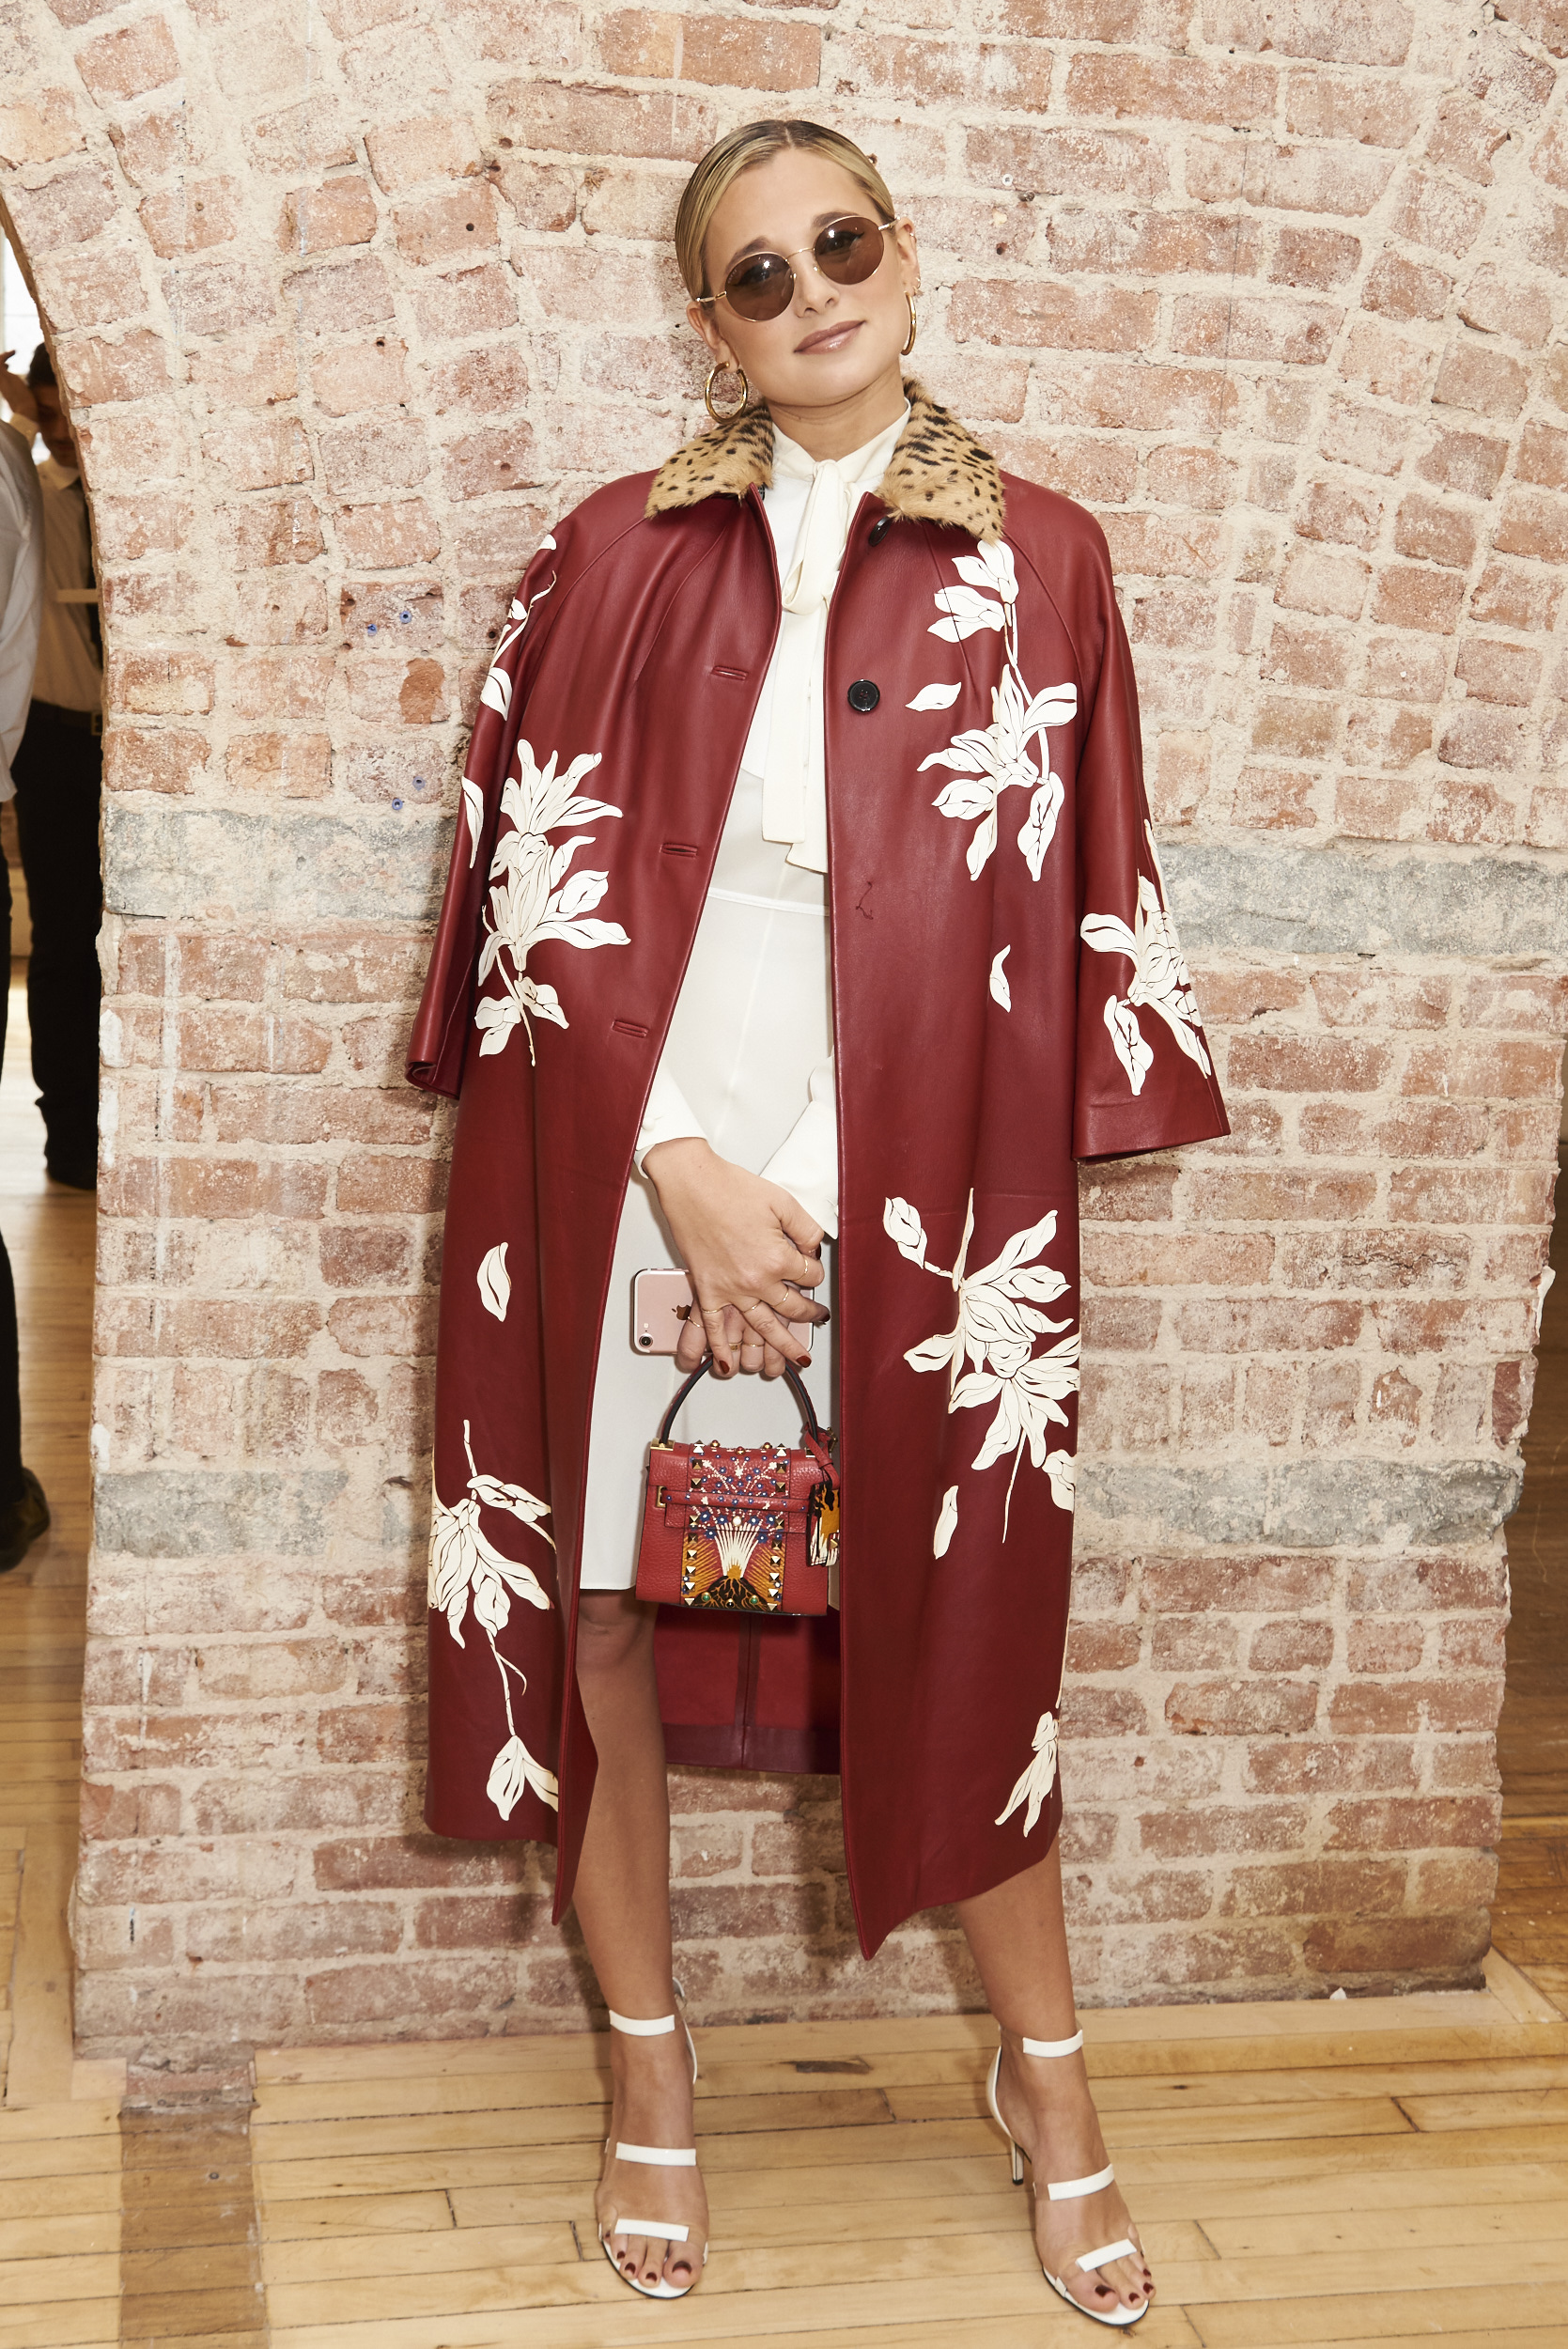 Valentino-resort-2018-front-row-fashion-show-the-impression-002